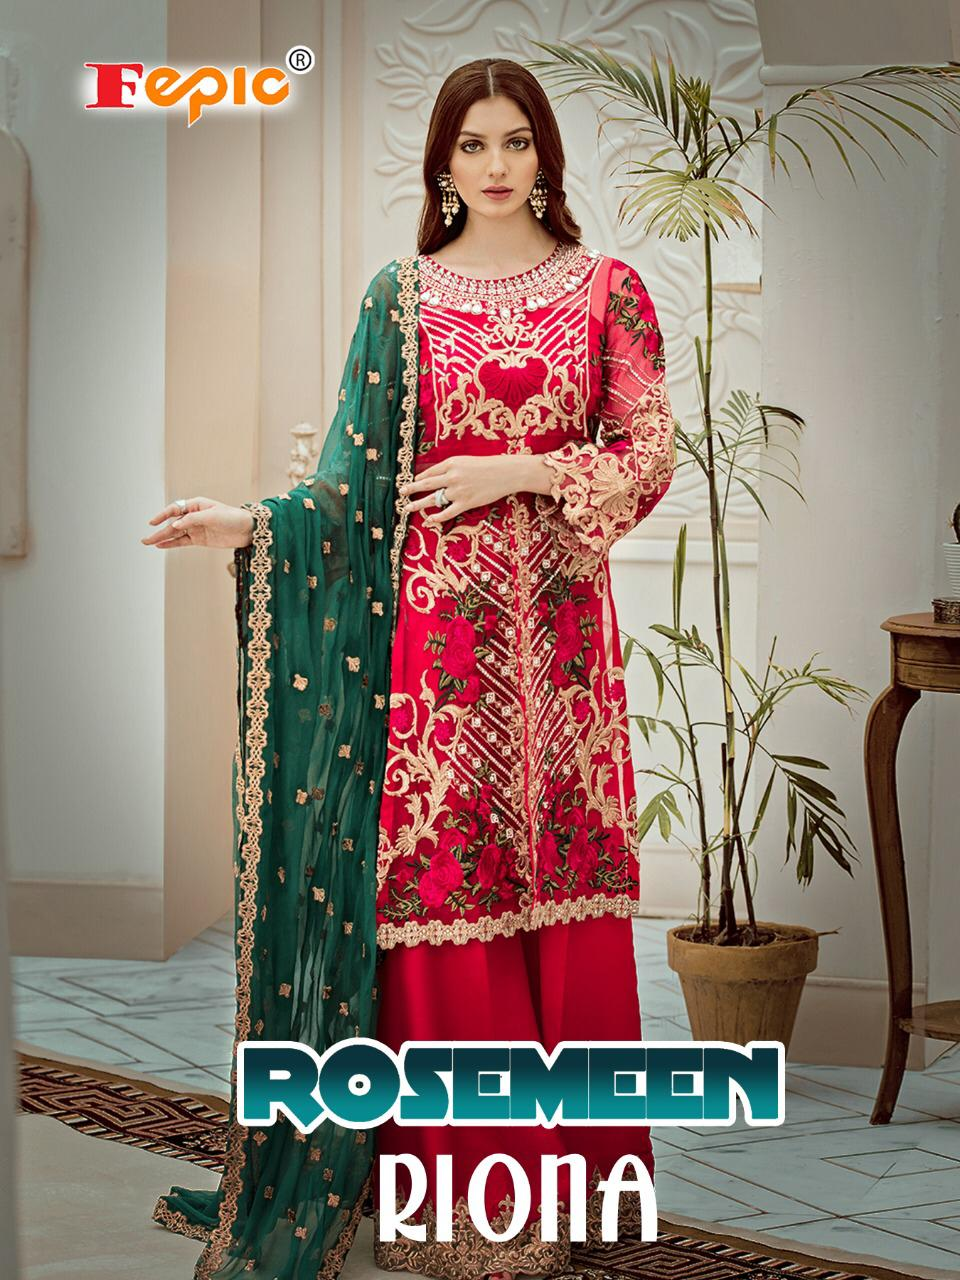 Fepic rosemeen riona premium collection of Salwar suit